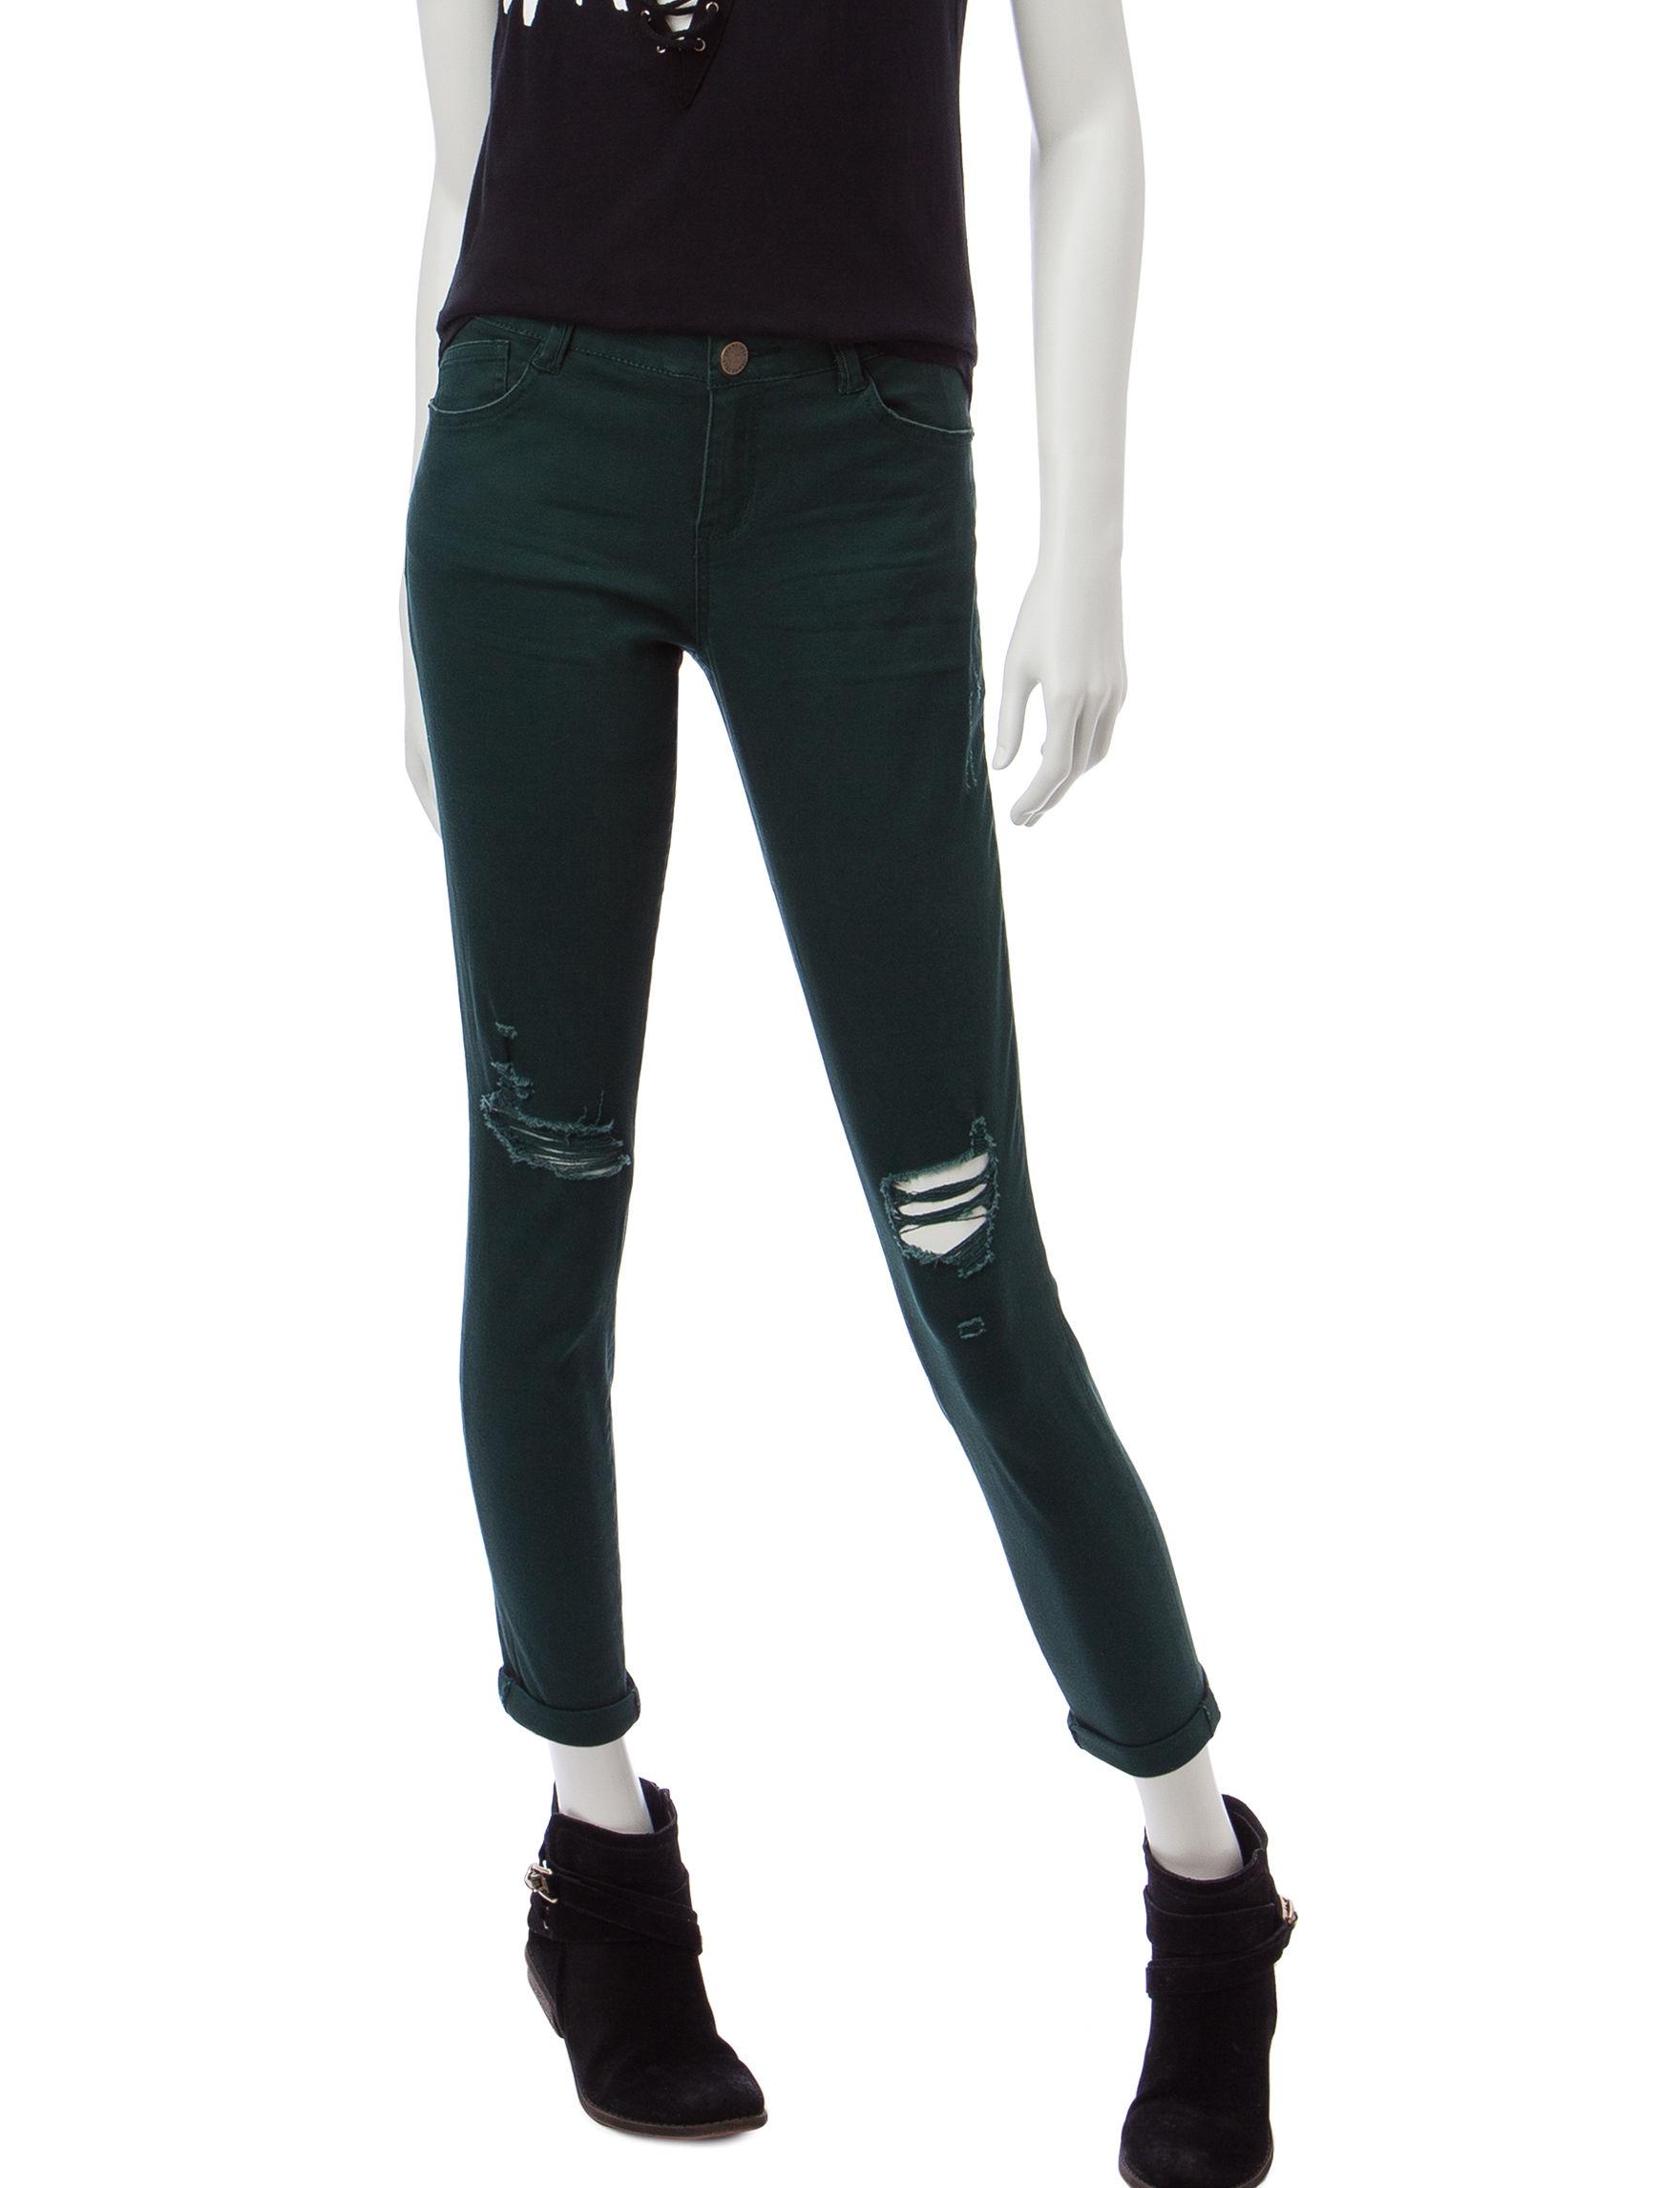 Jolt Green Skinny